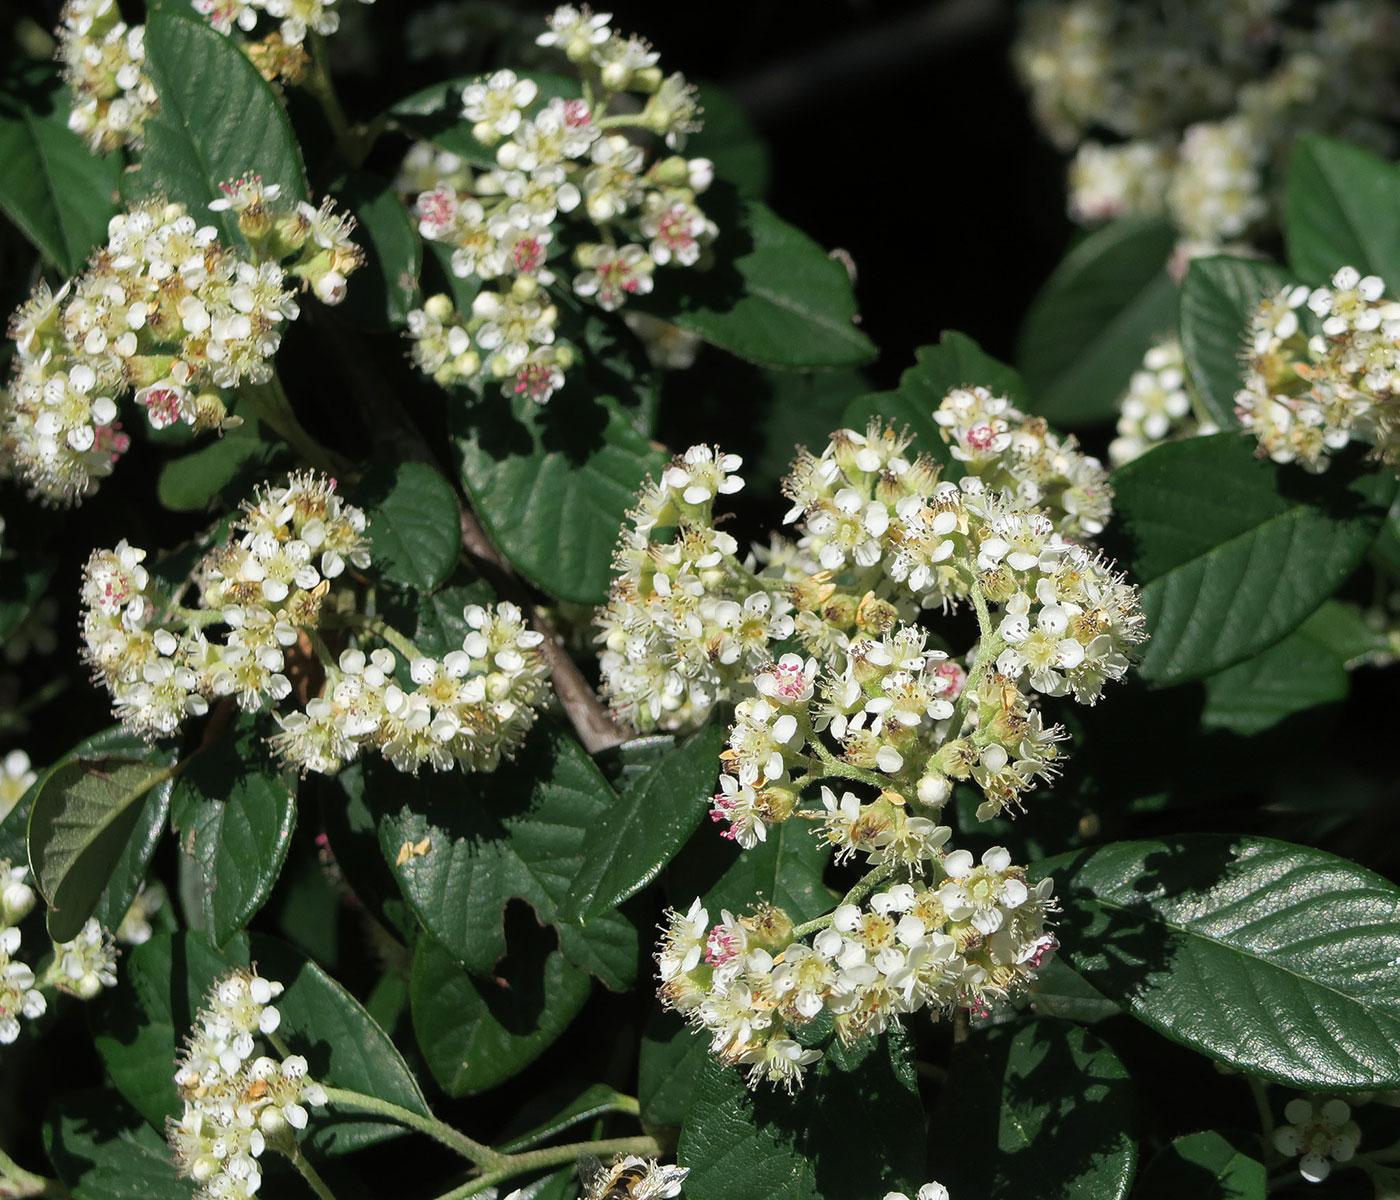 Buisson Ardent - Fleurs. Crédits : John Rusk - Flickr